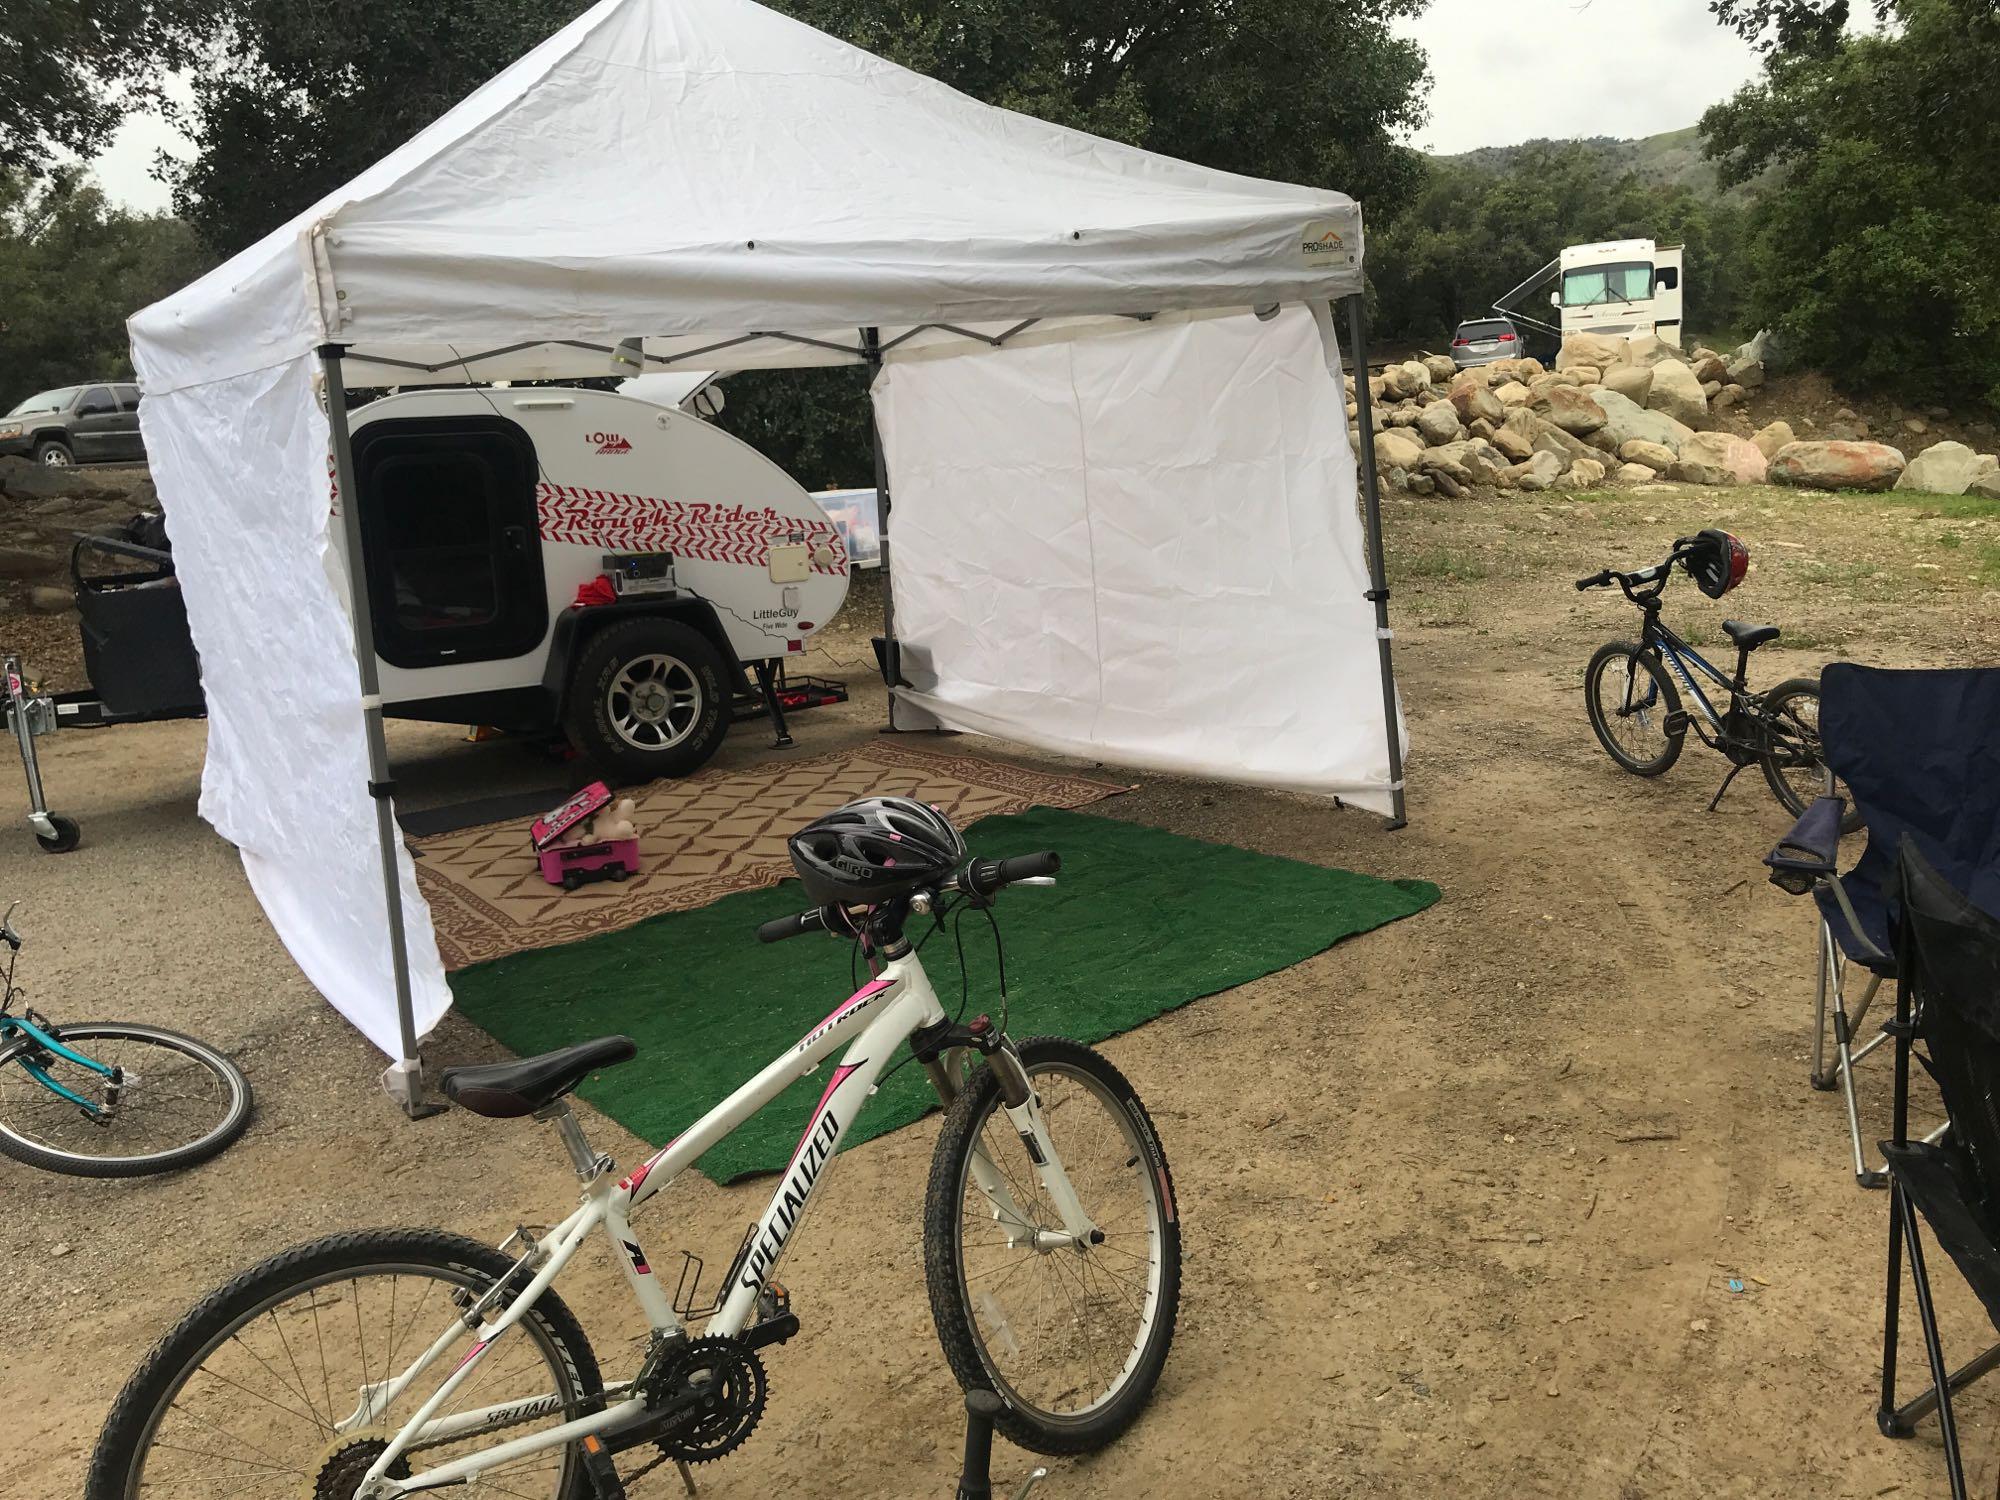 10x10 pop up tent with removable sides. LittleGuy LittleGuy5Wideroughrider 2016